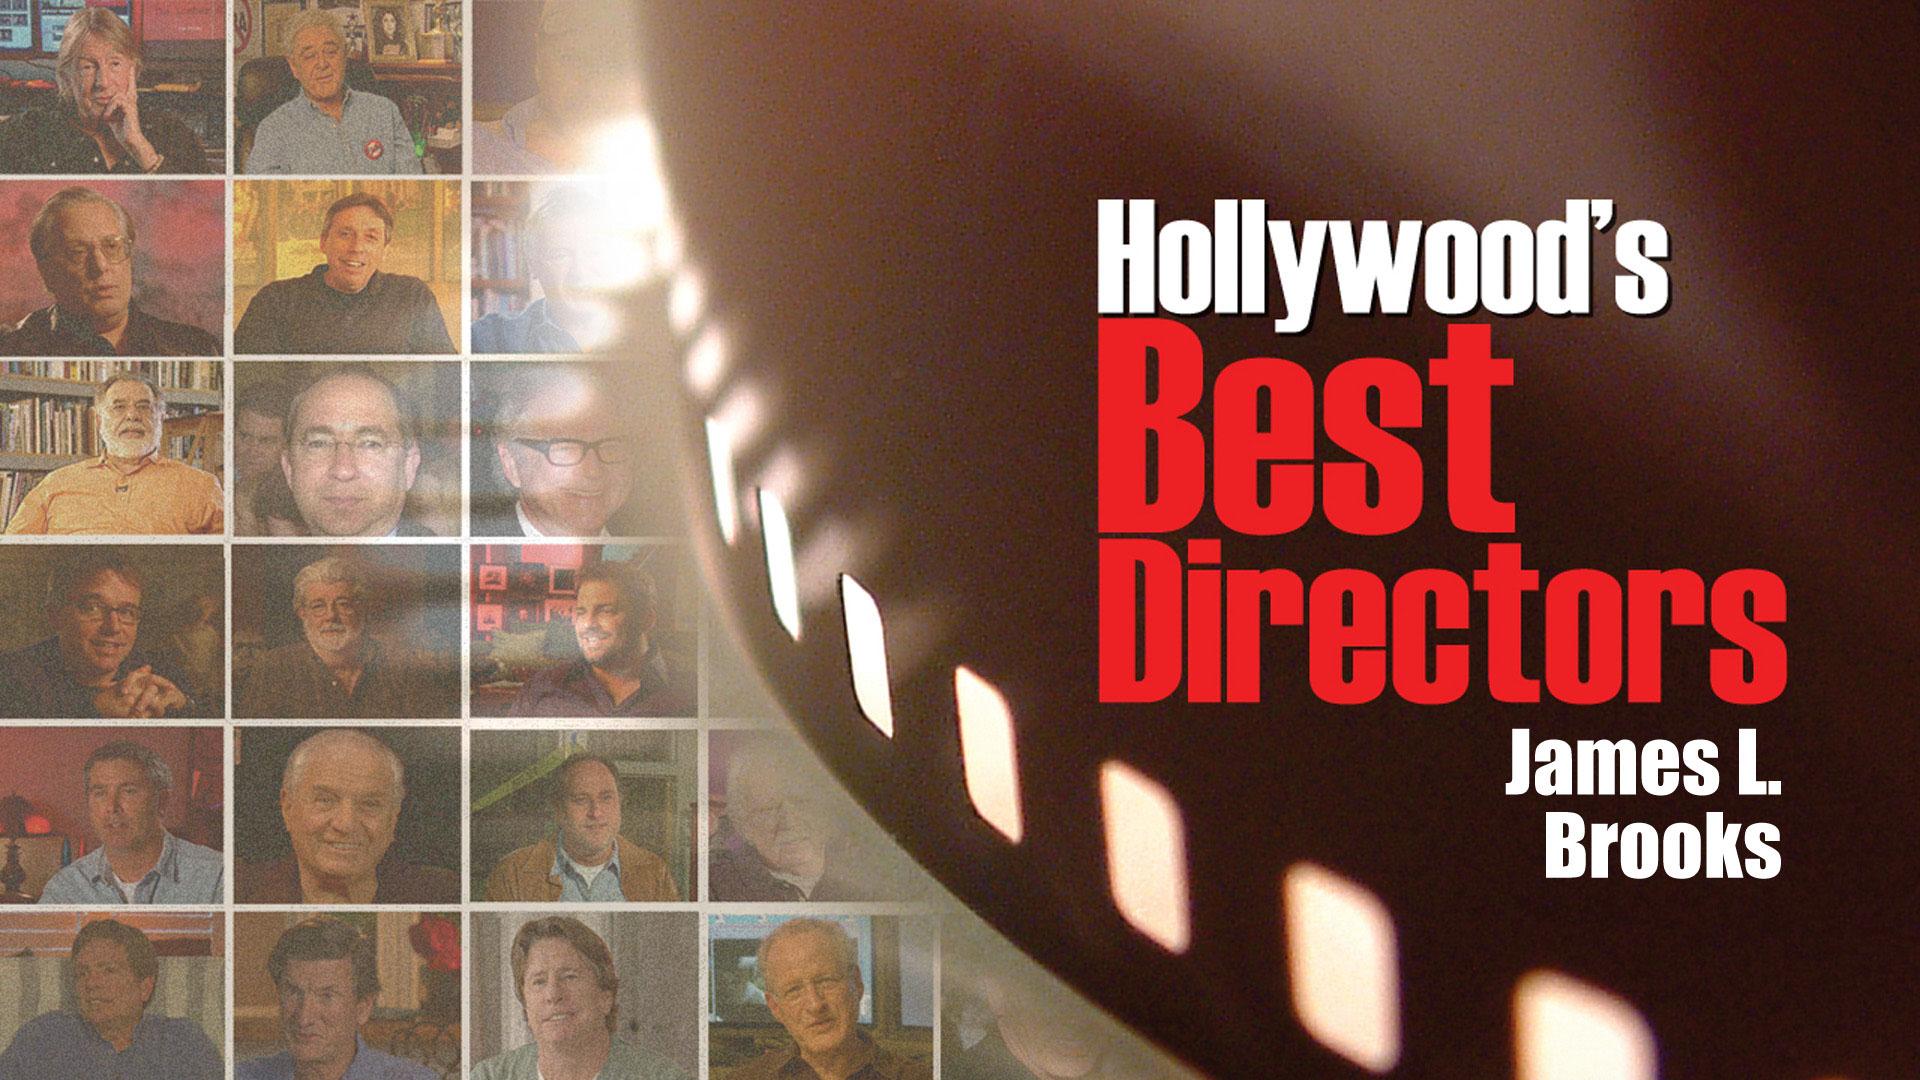 James L. Brooks: Hollywood's Best Film Directors